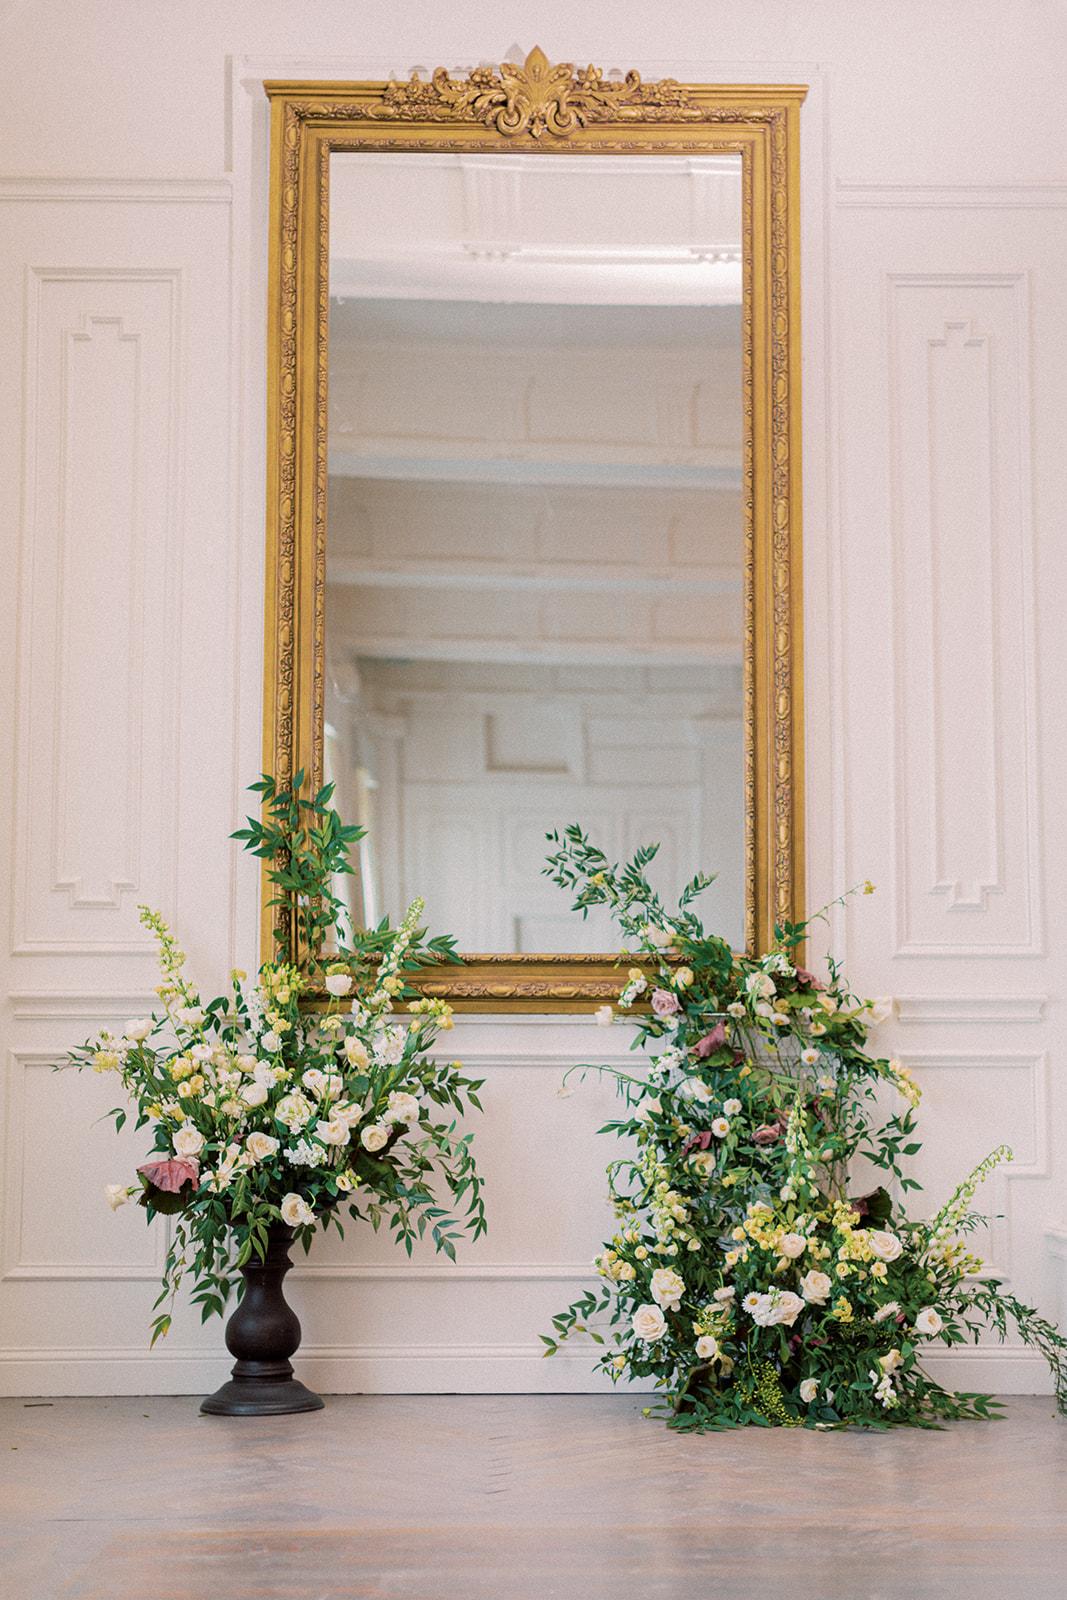 Alba Dahlia Floral wedding ceremony decor